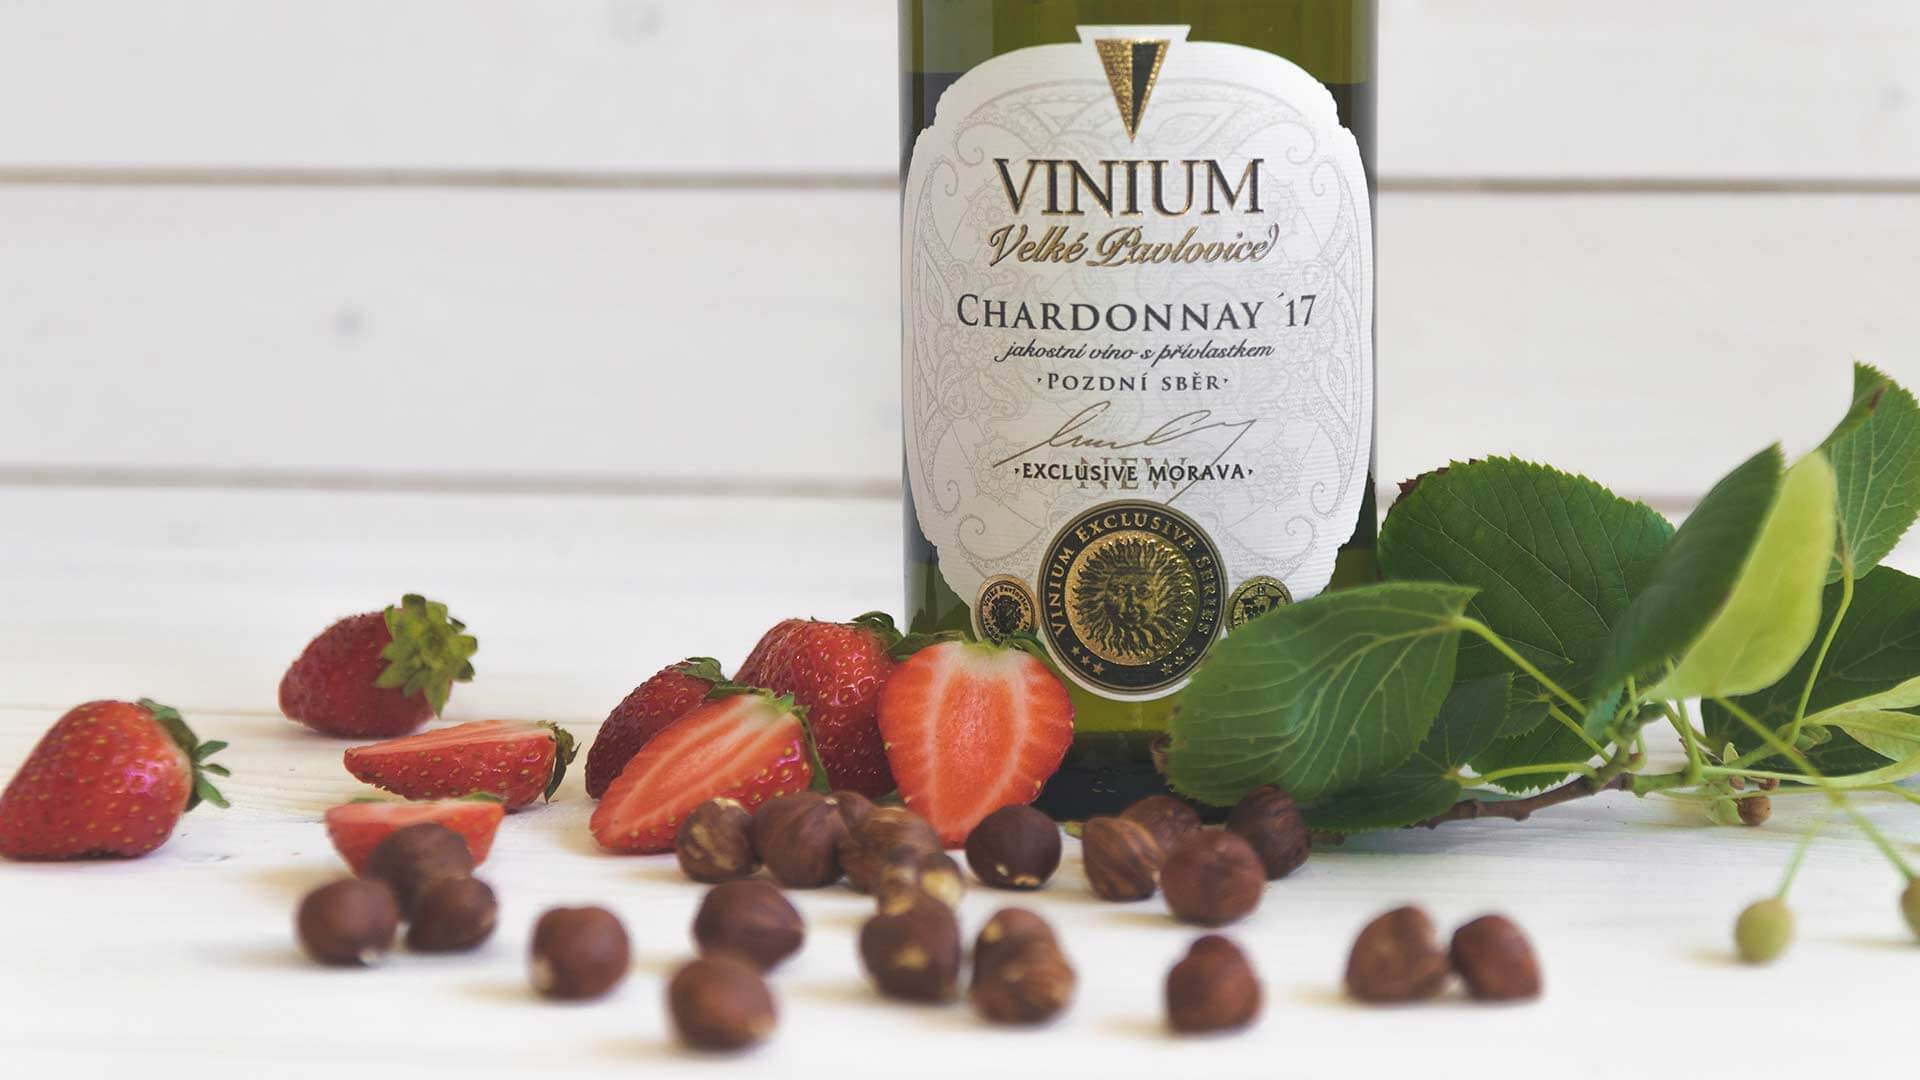 Chardonnay 2017, pozdní sběr, VINIUM Exclusive